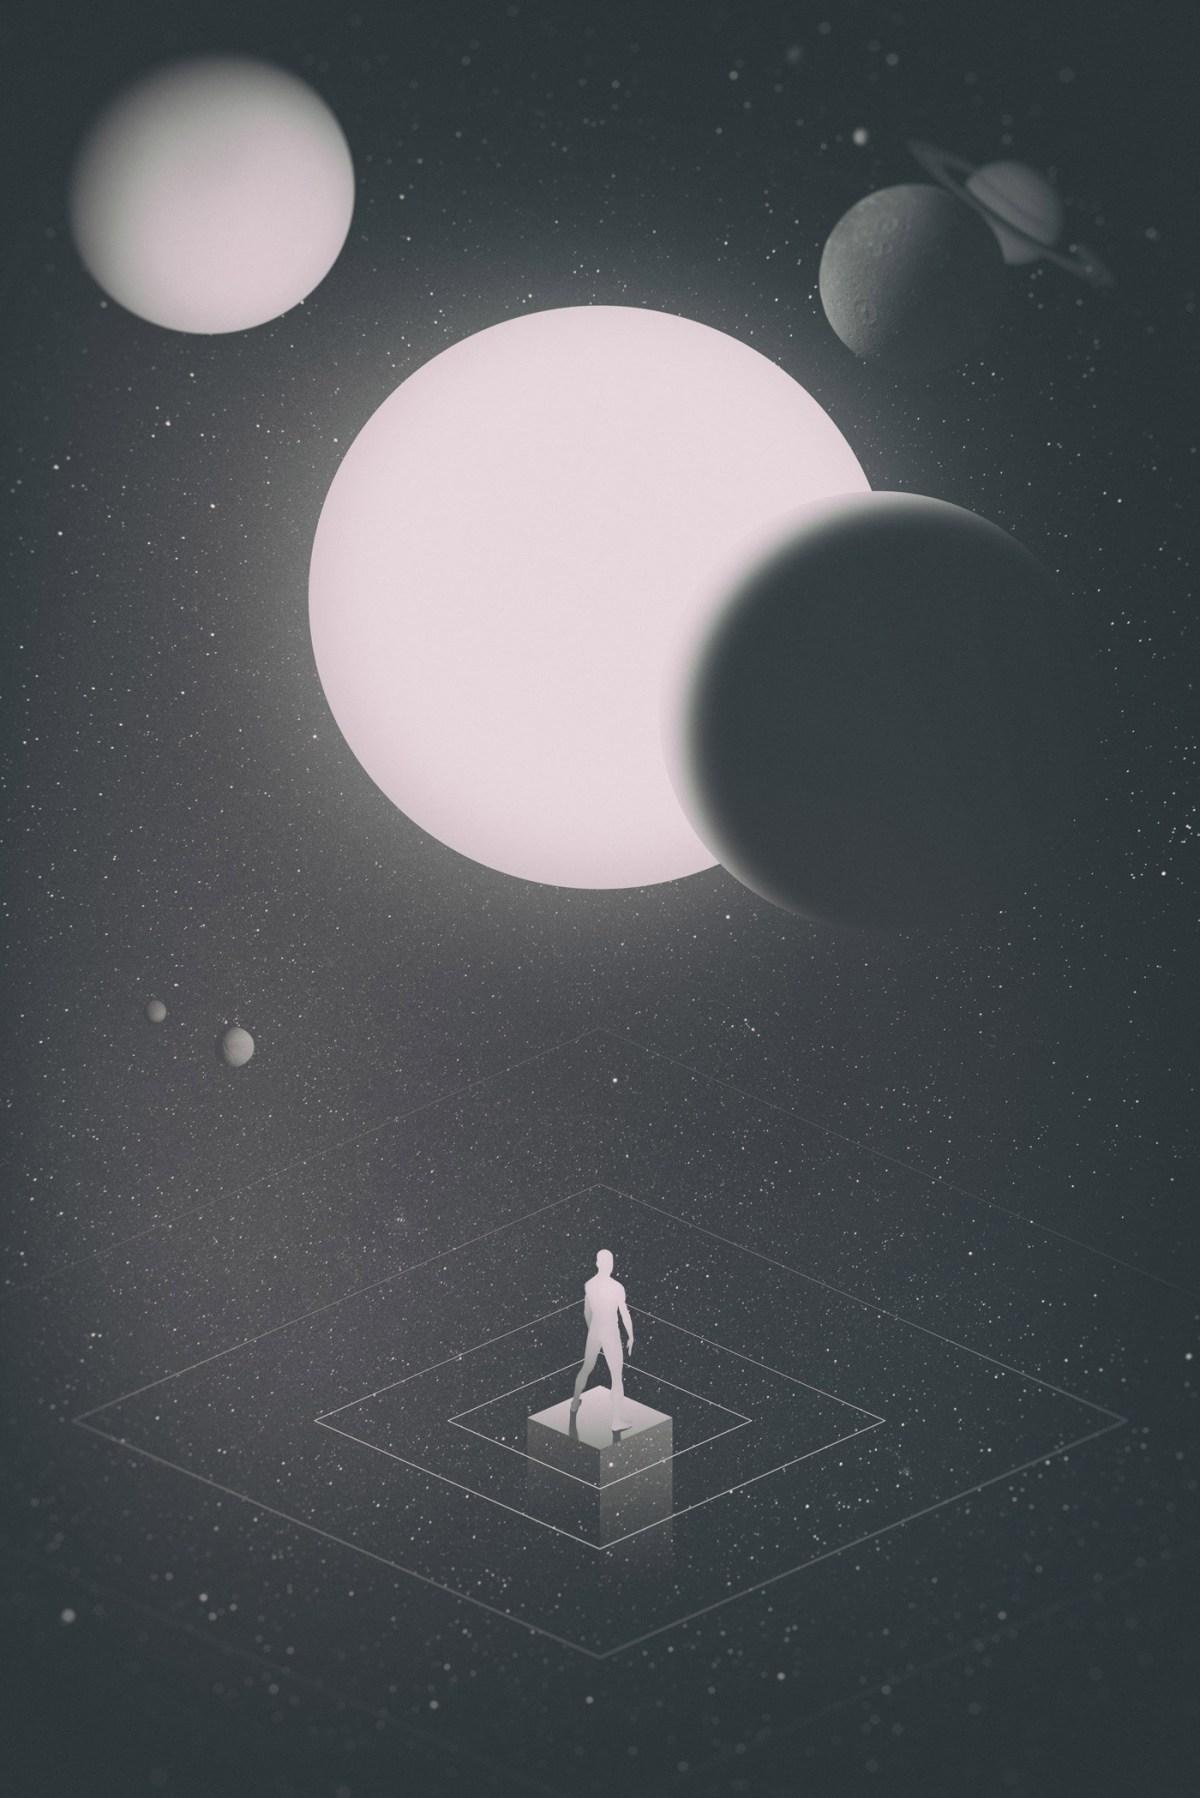 illustration-anxo-vizcaino-01